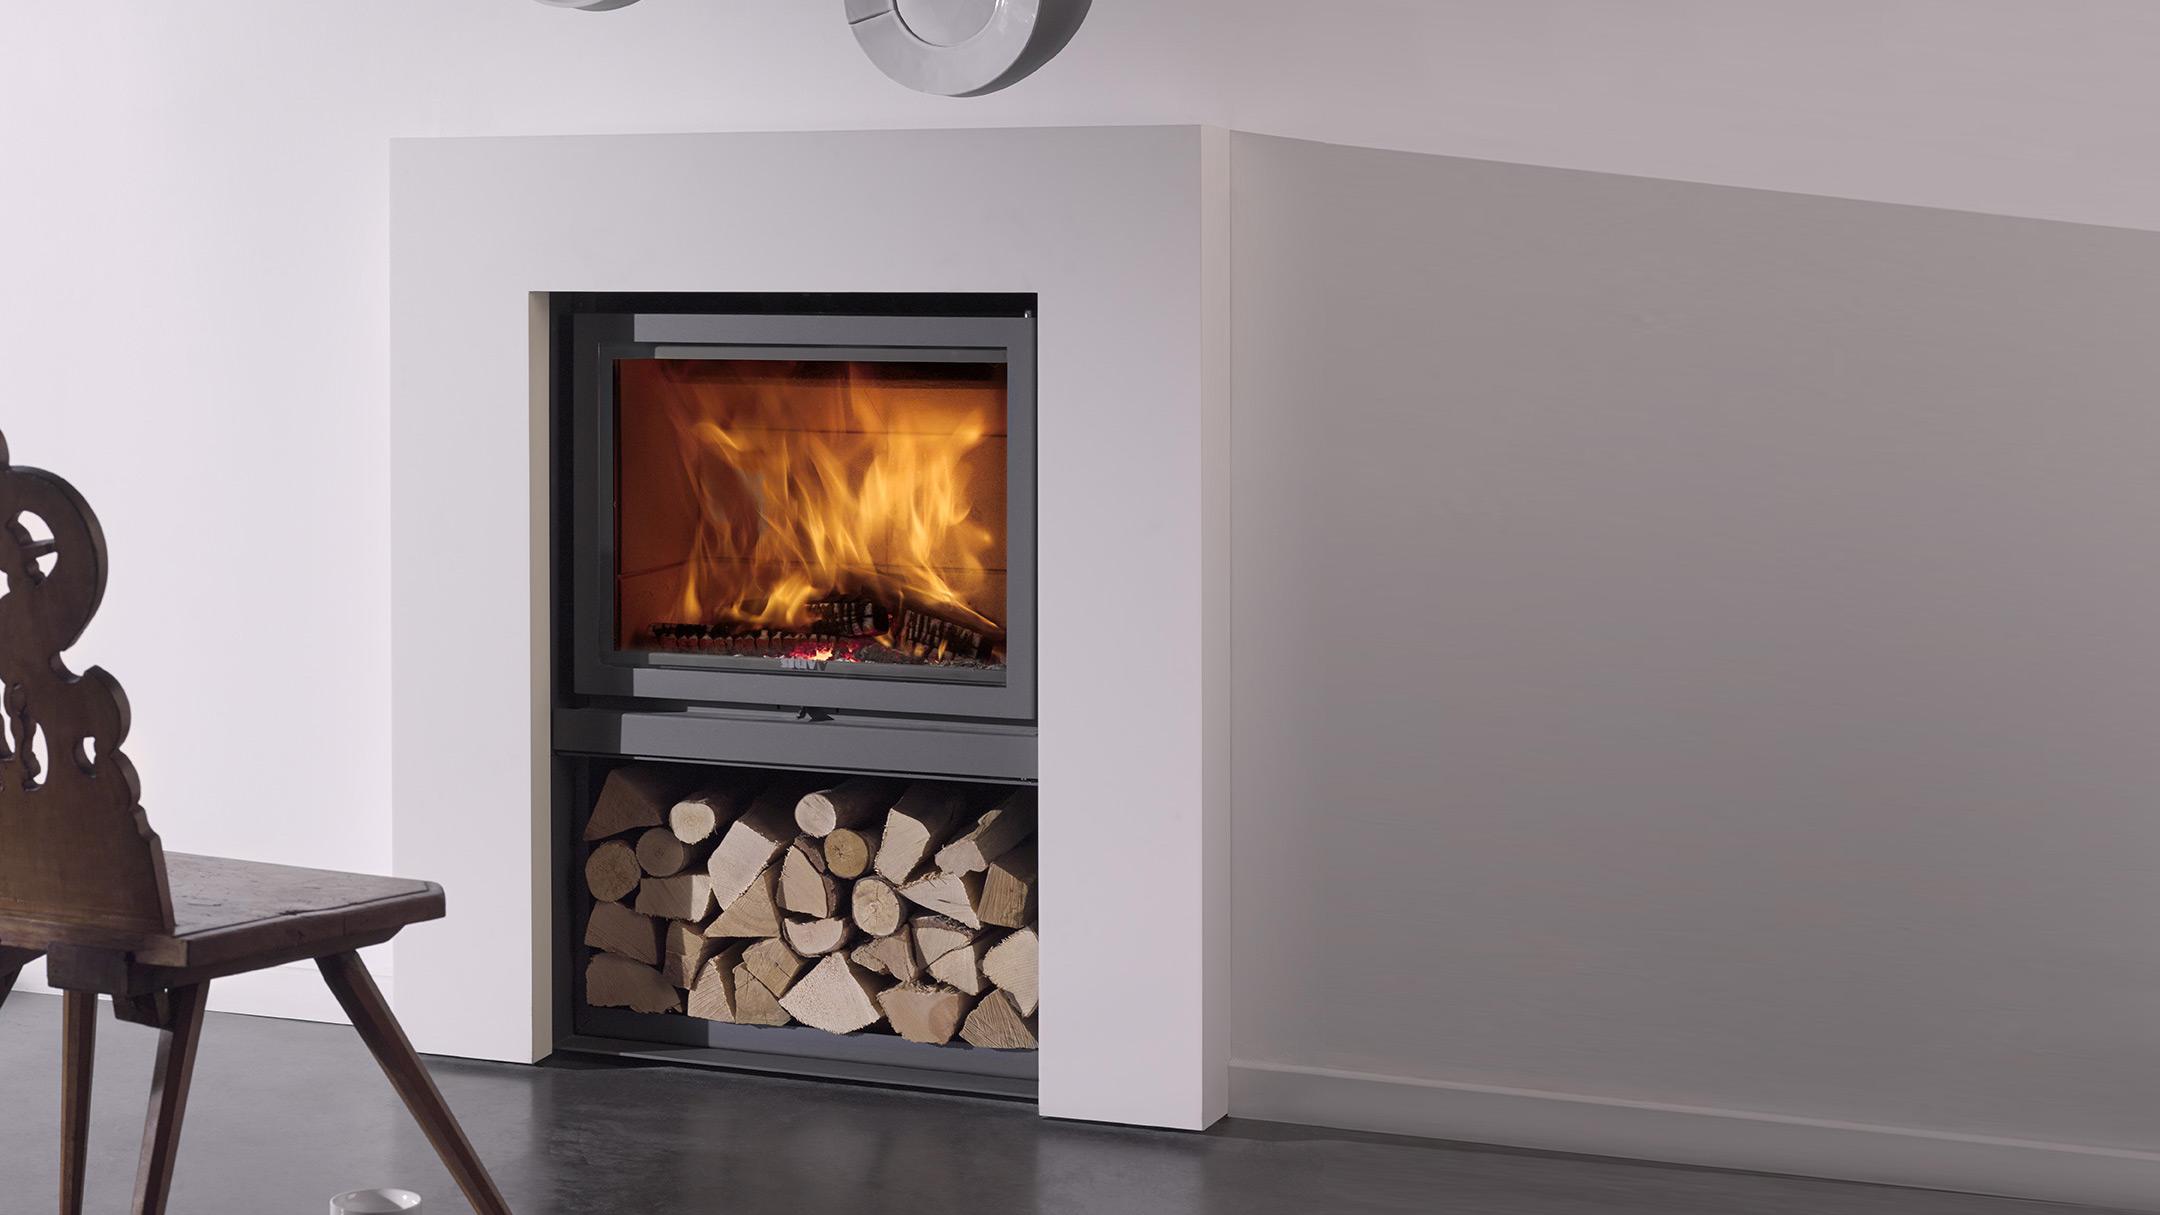 stv 16 decorative fireplace - Decorative Fireplace